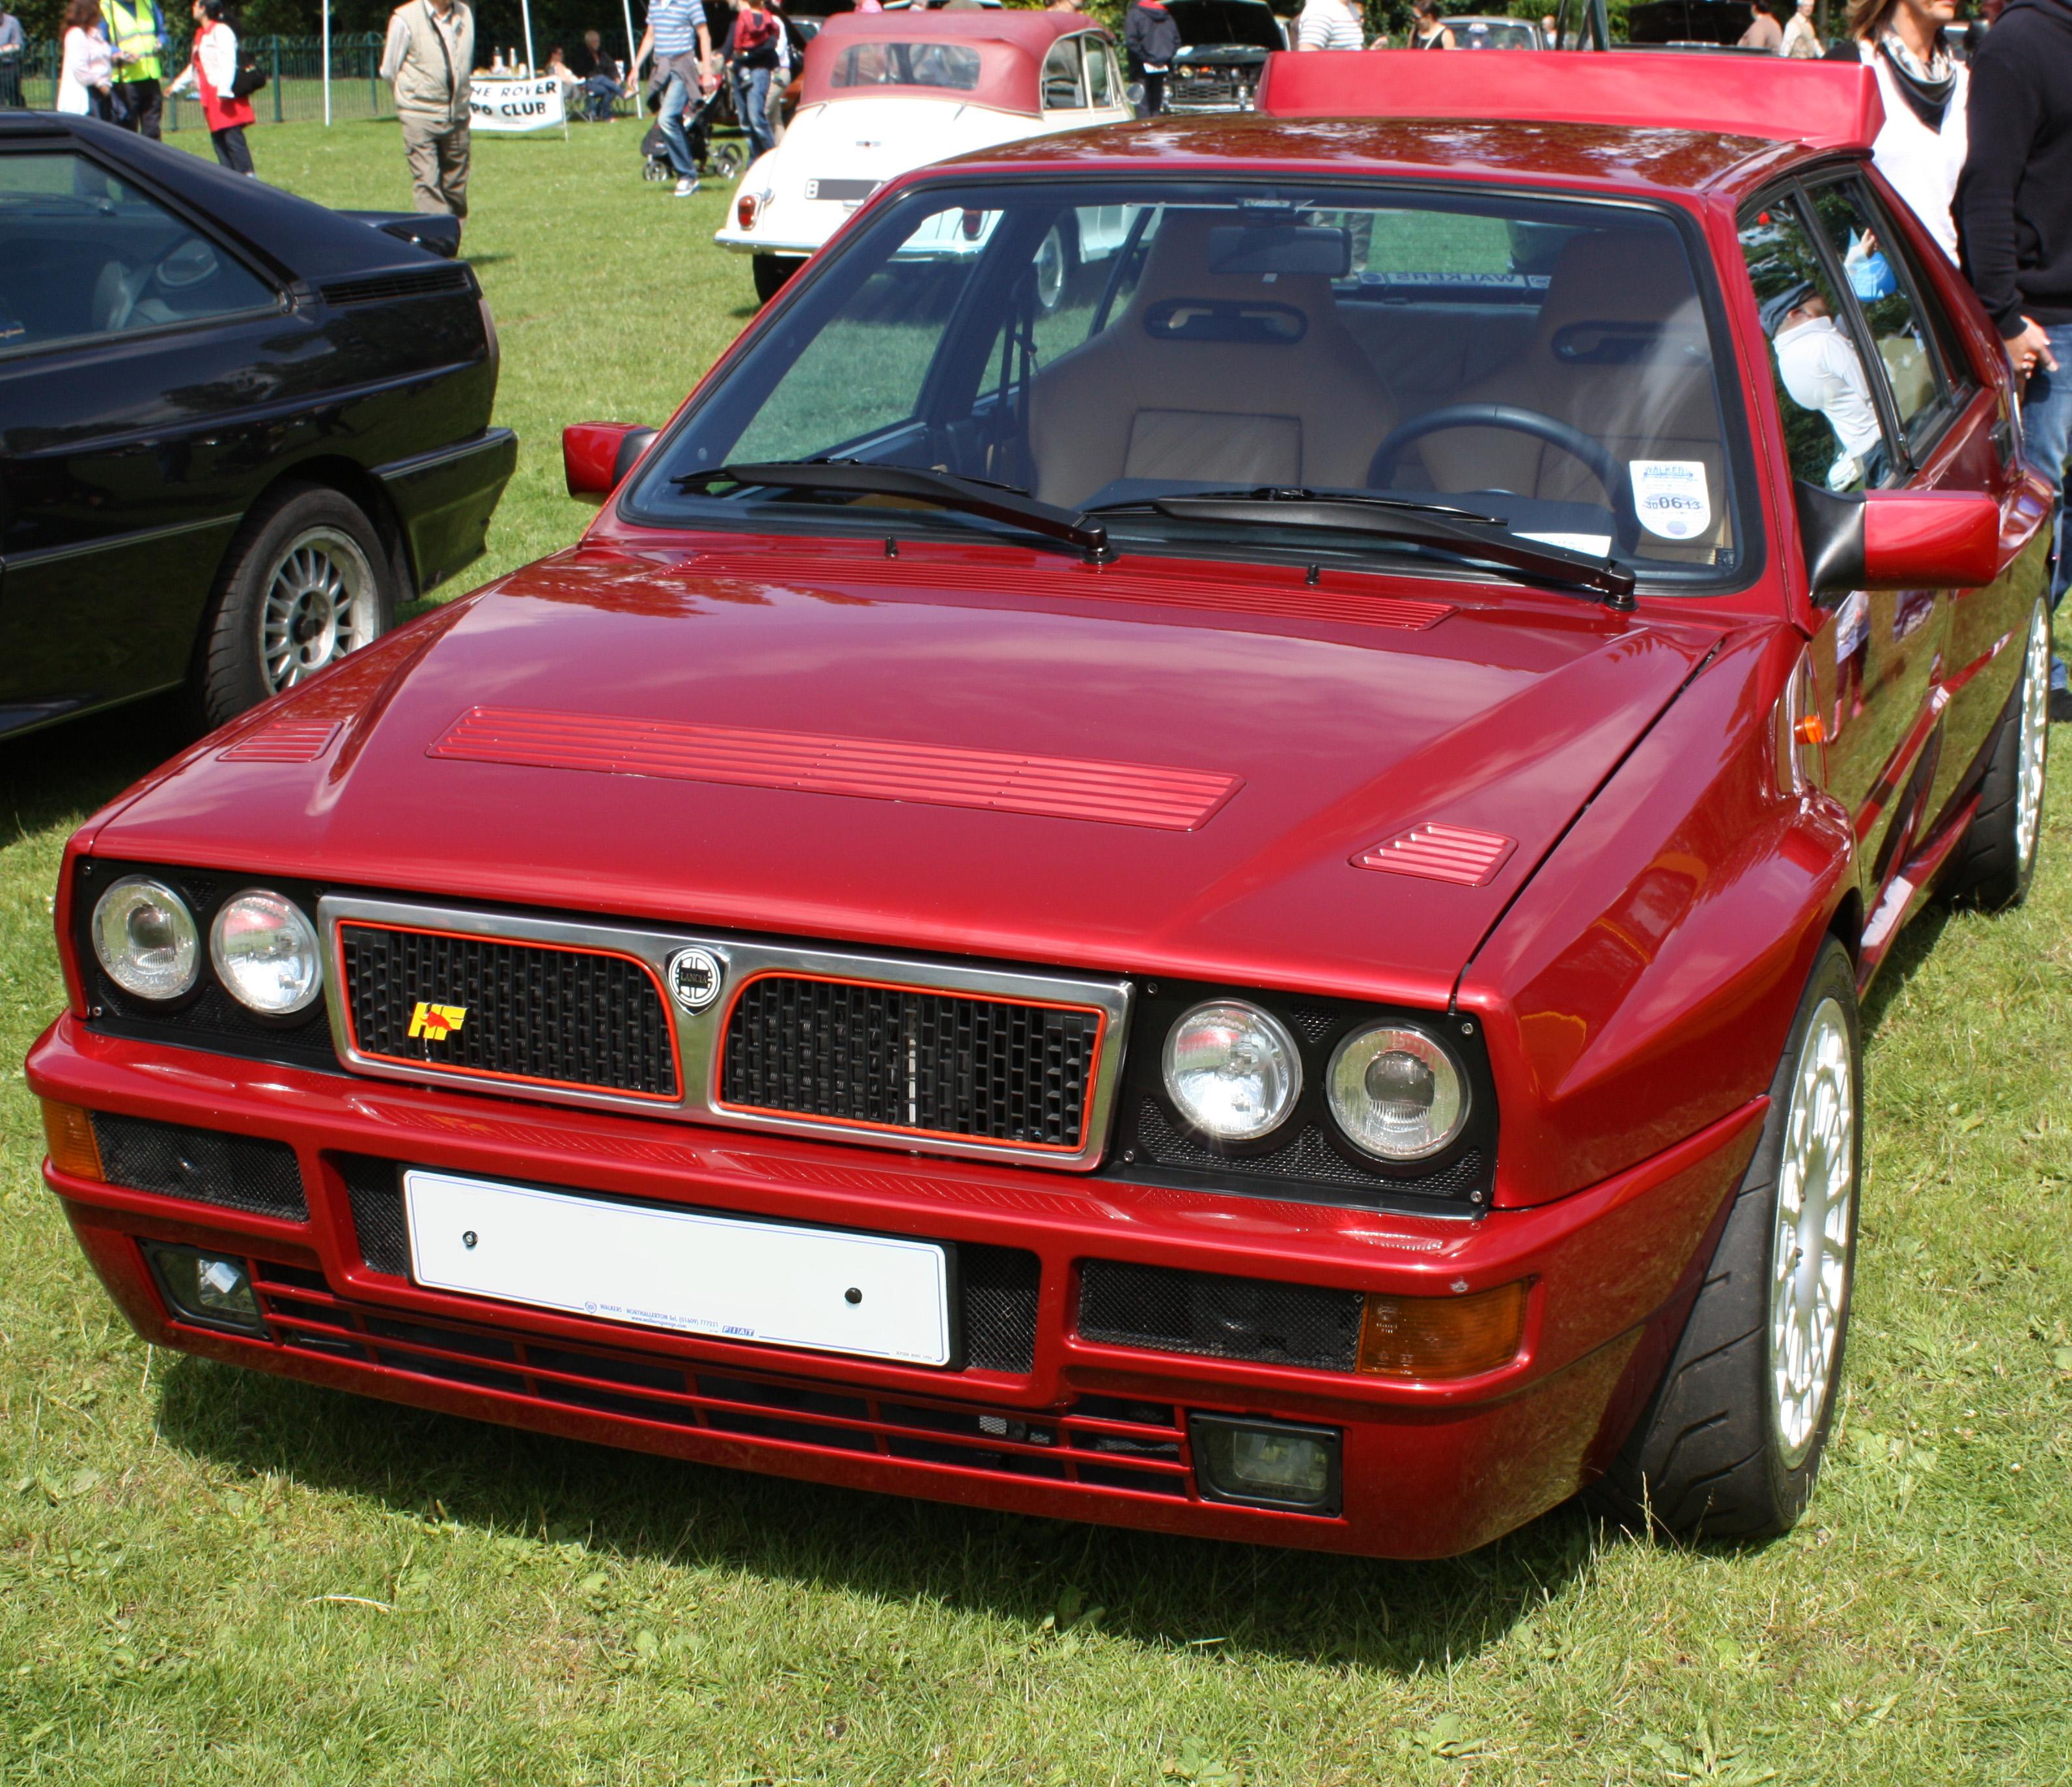 File:Lancia Delta HF Integrale - Flickr - exfordy.jpg